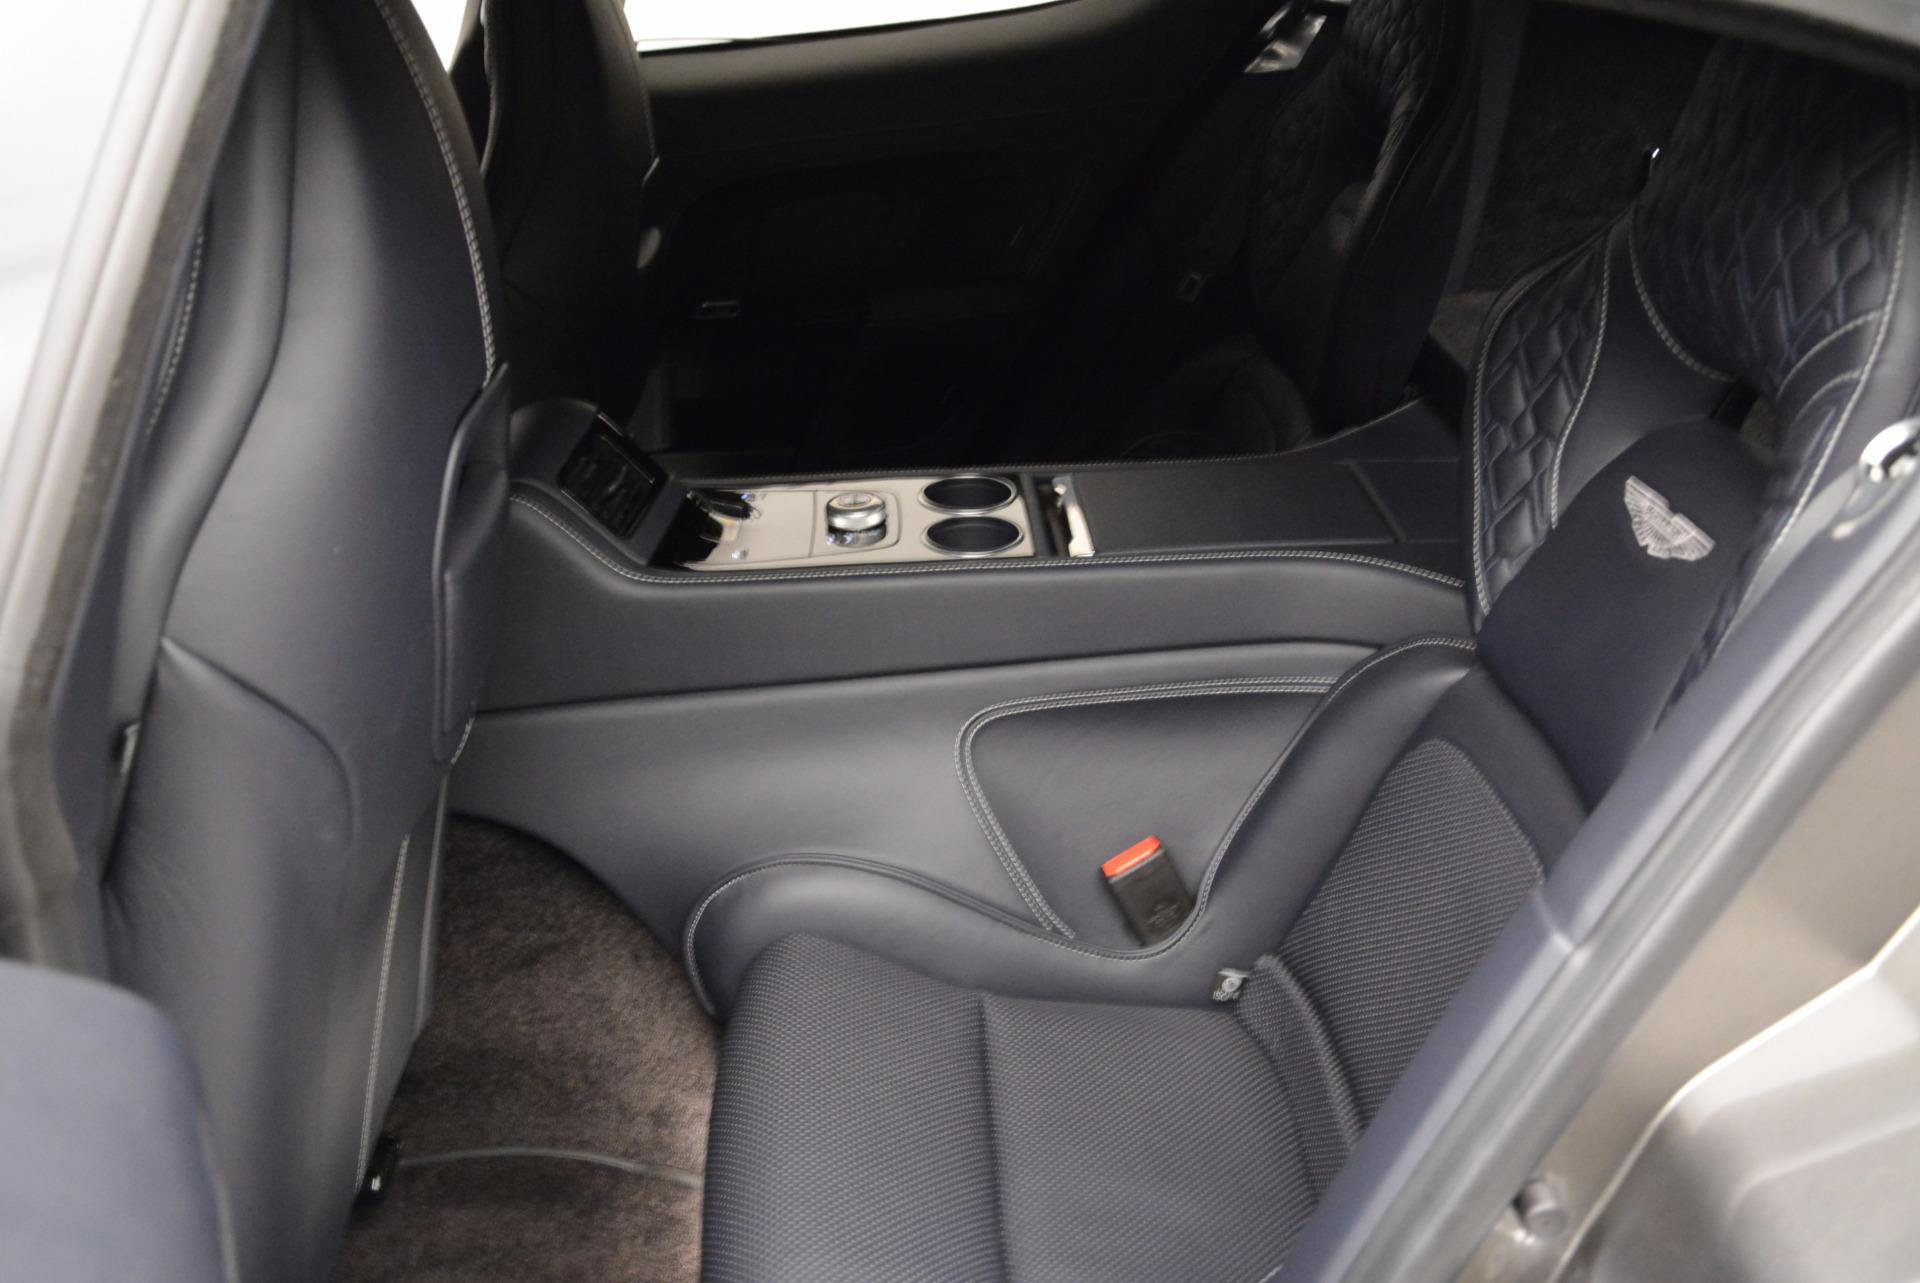 Used 2017 Aston Martin Rapide S Sedan For Sale In Greenwich, CT 1843_p17